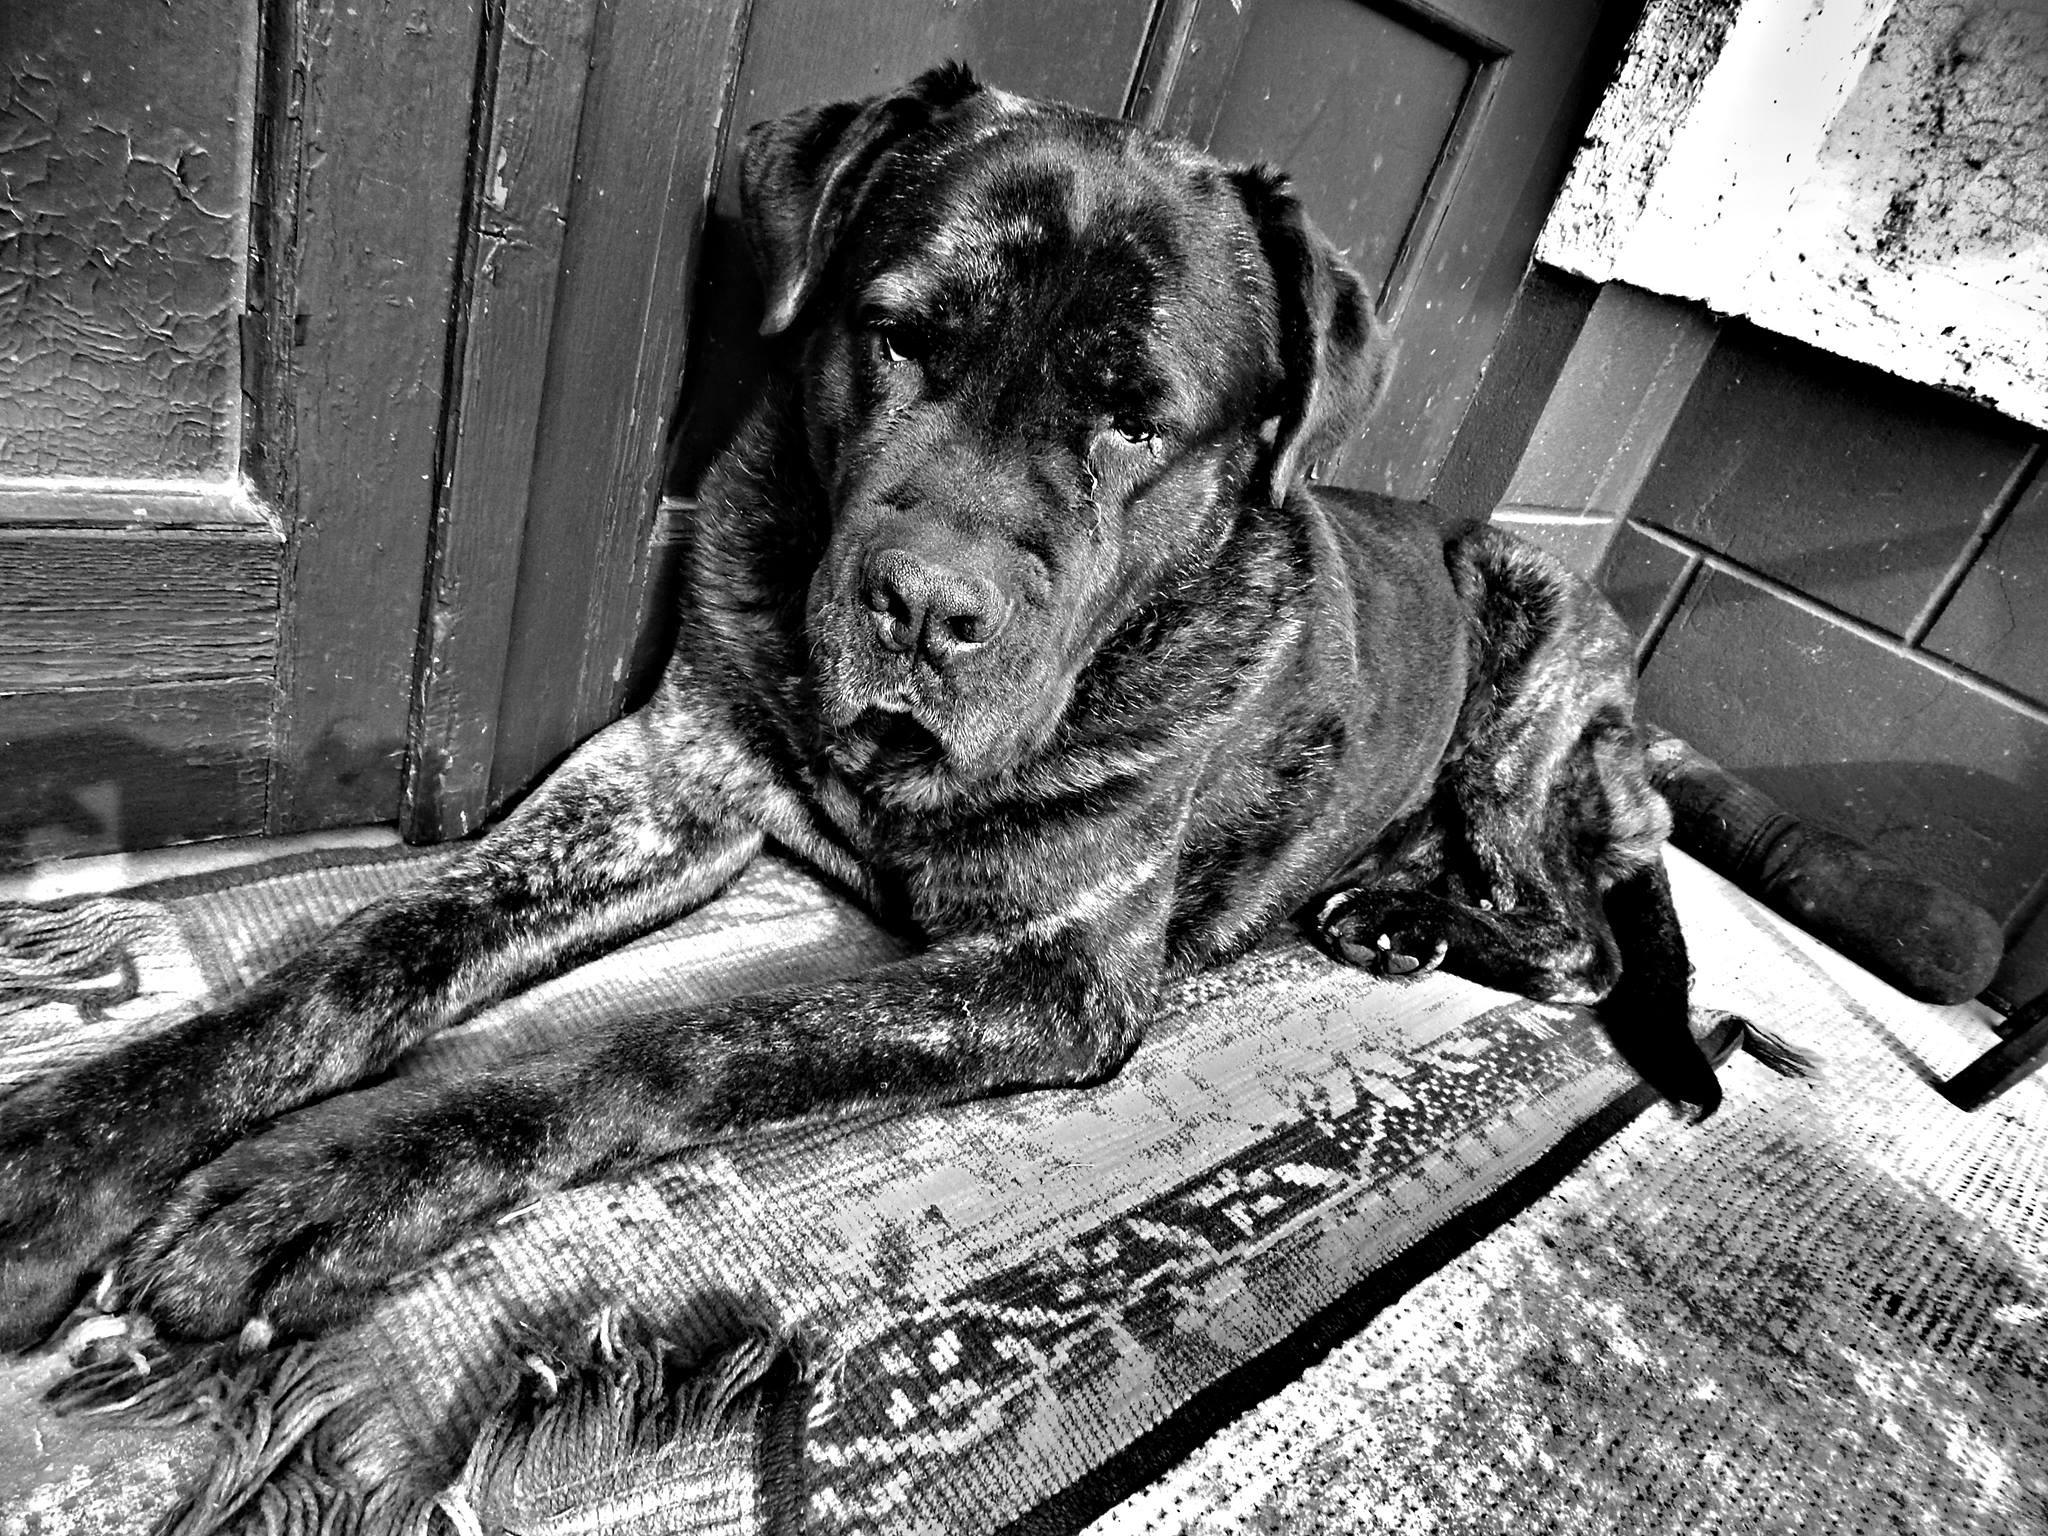 General 2048x1536 monochrome animals dog cane corso